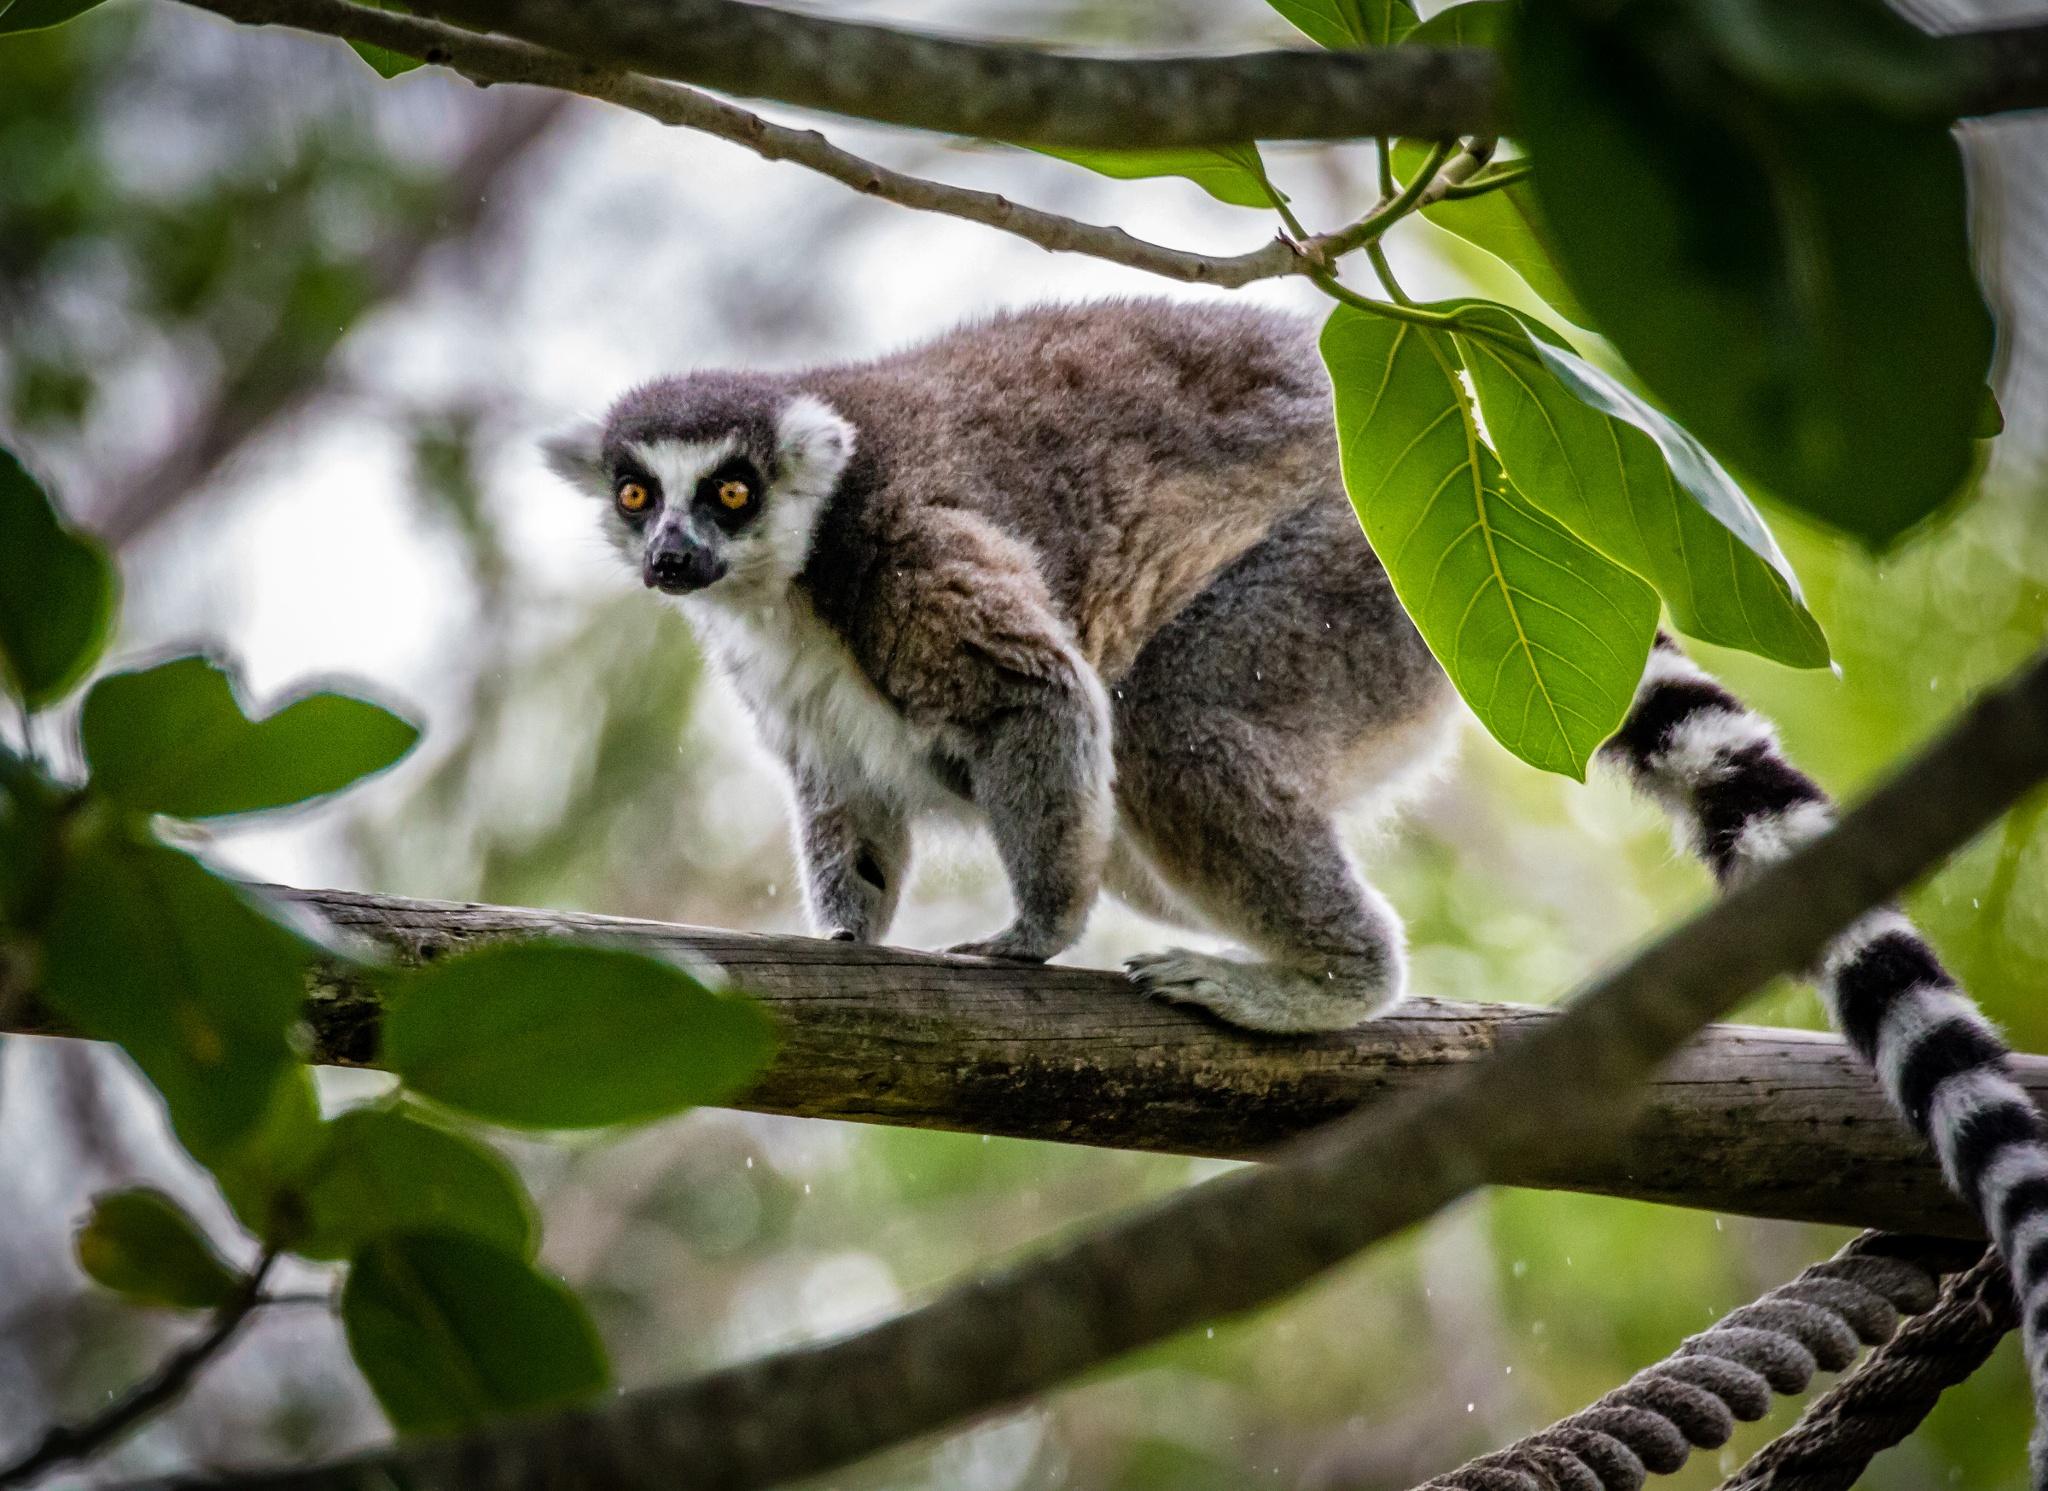 Lemur under rain by Yaroslav Sobko